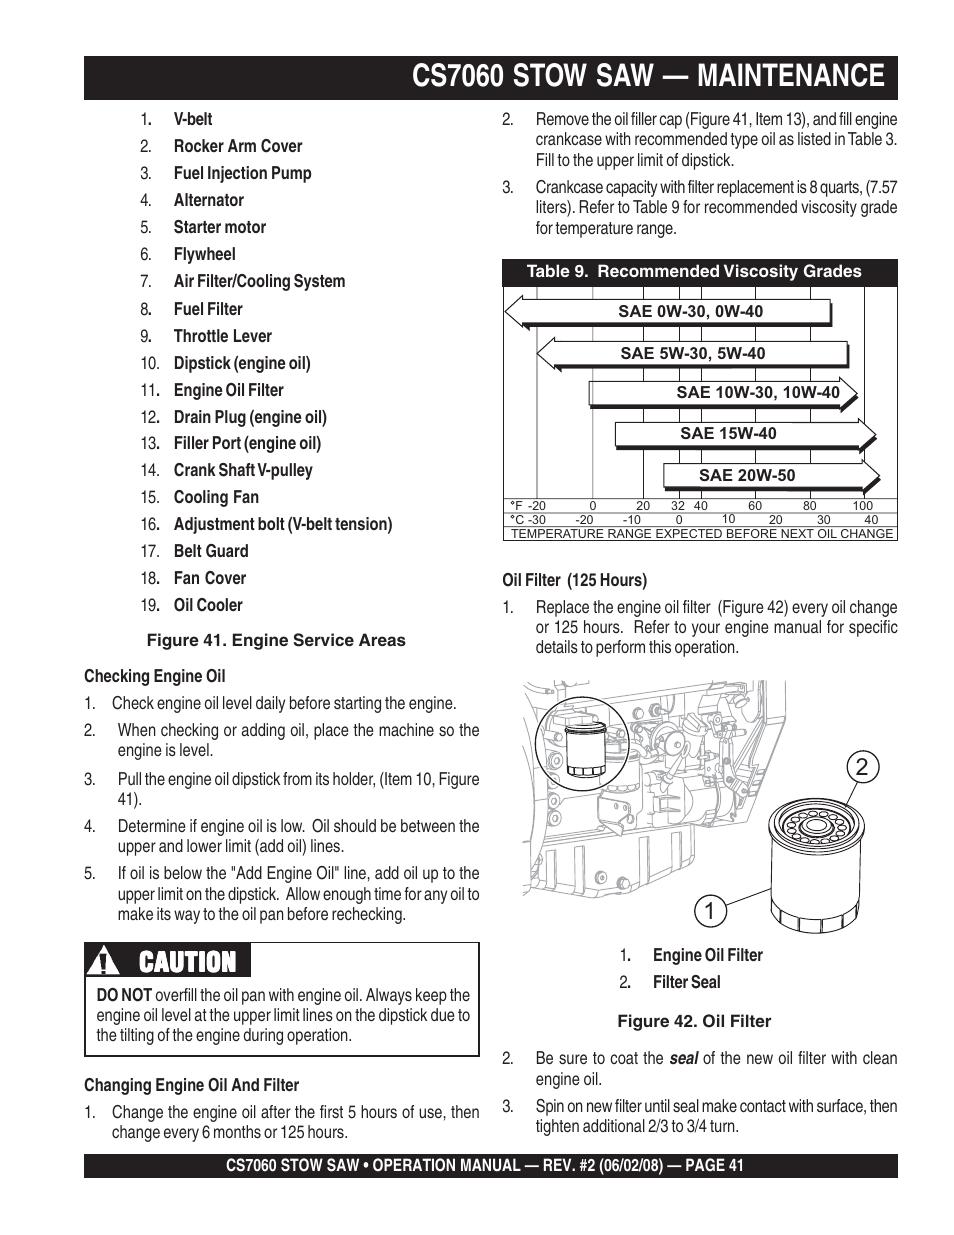 Cs7060 stow saw — maintenance, Caution | Multiquip CS706036 User Manual |  Page 41 / 66